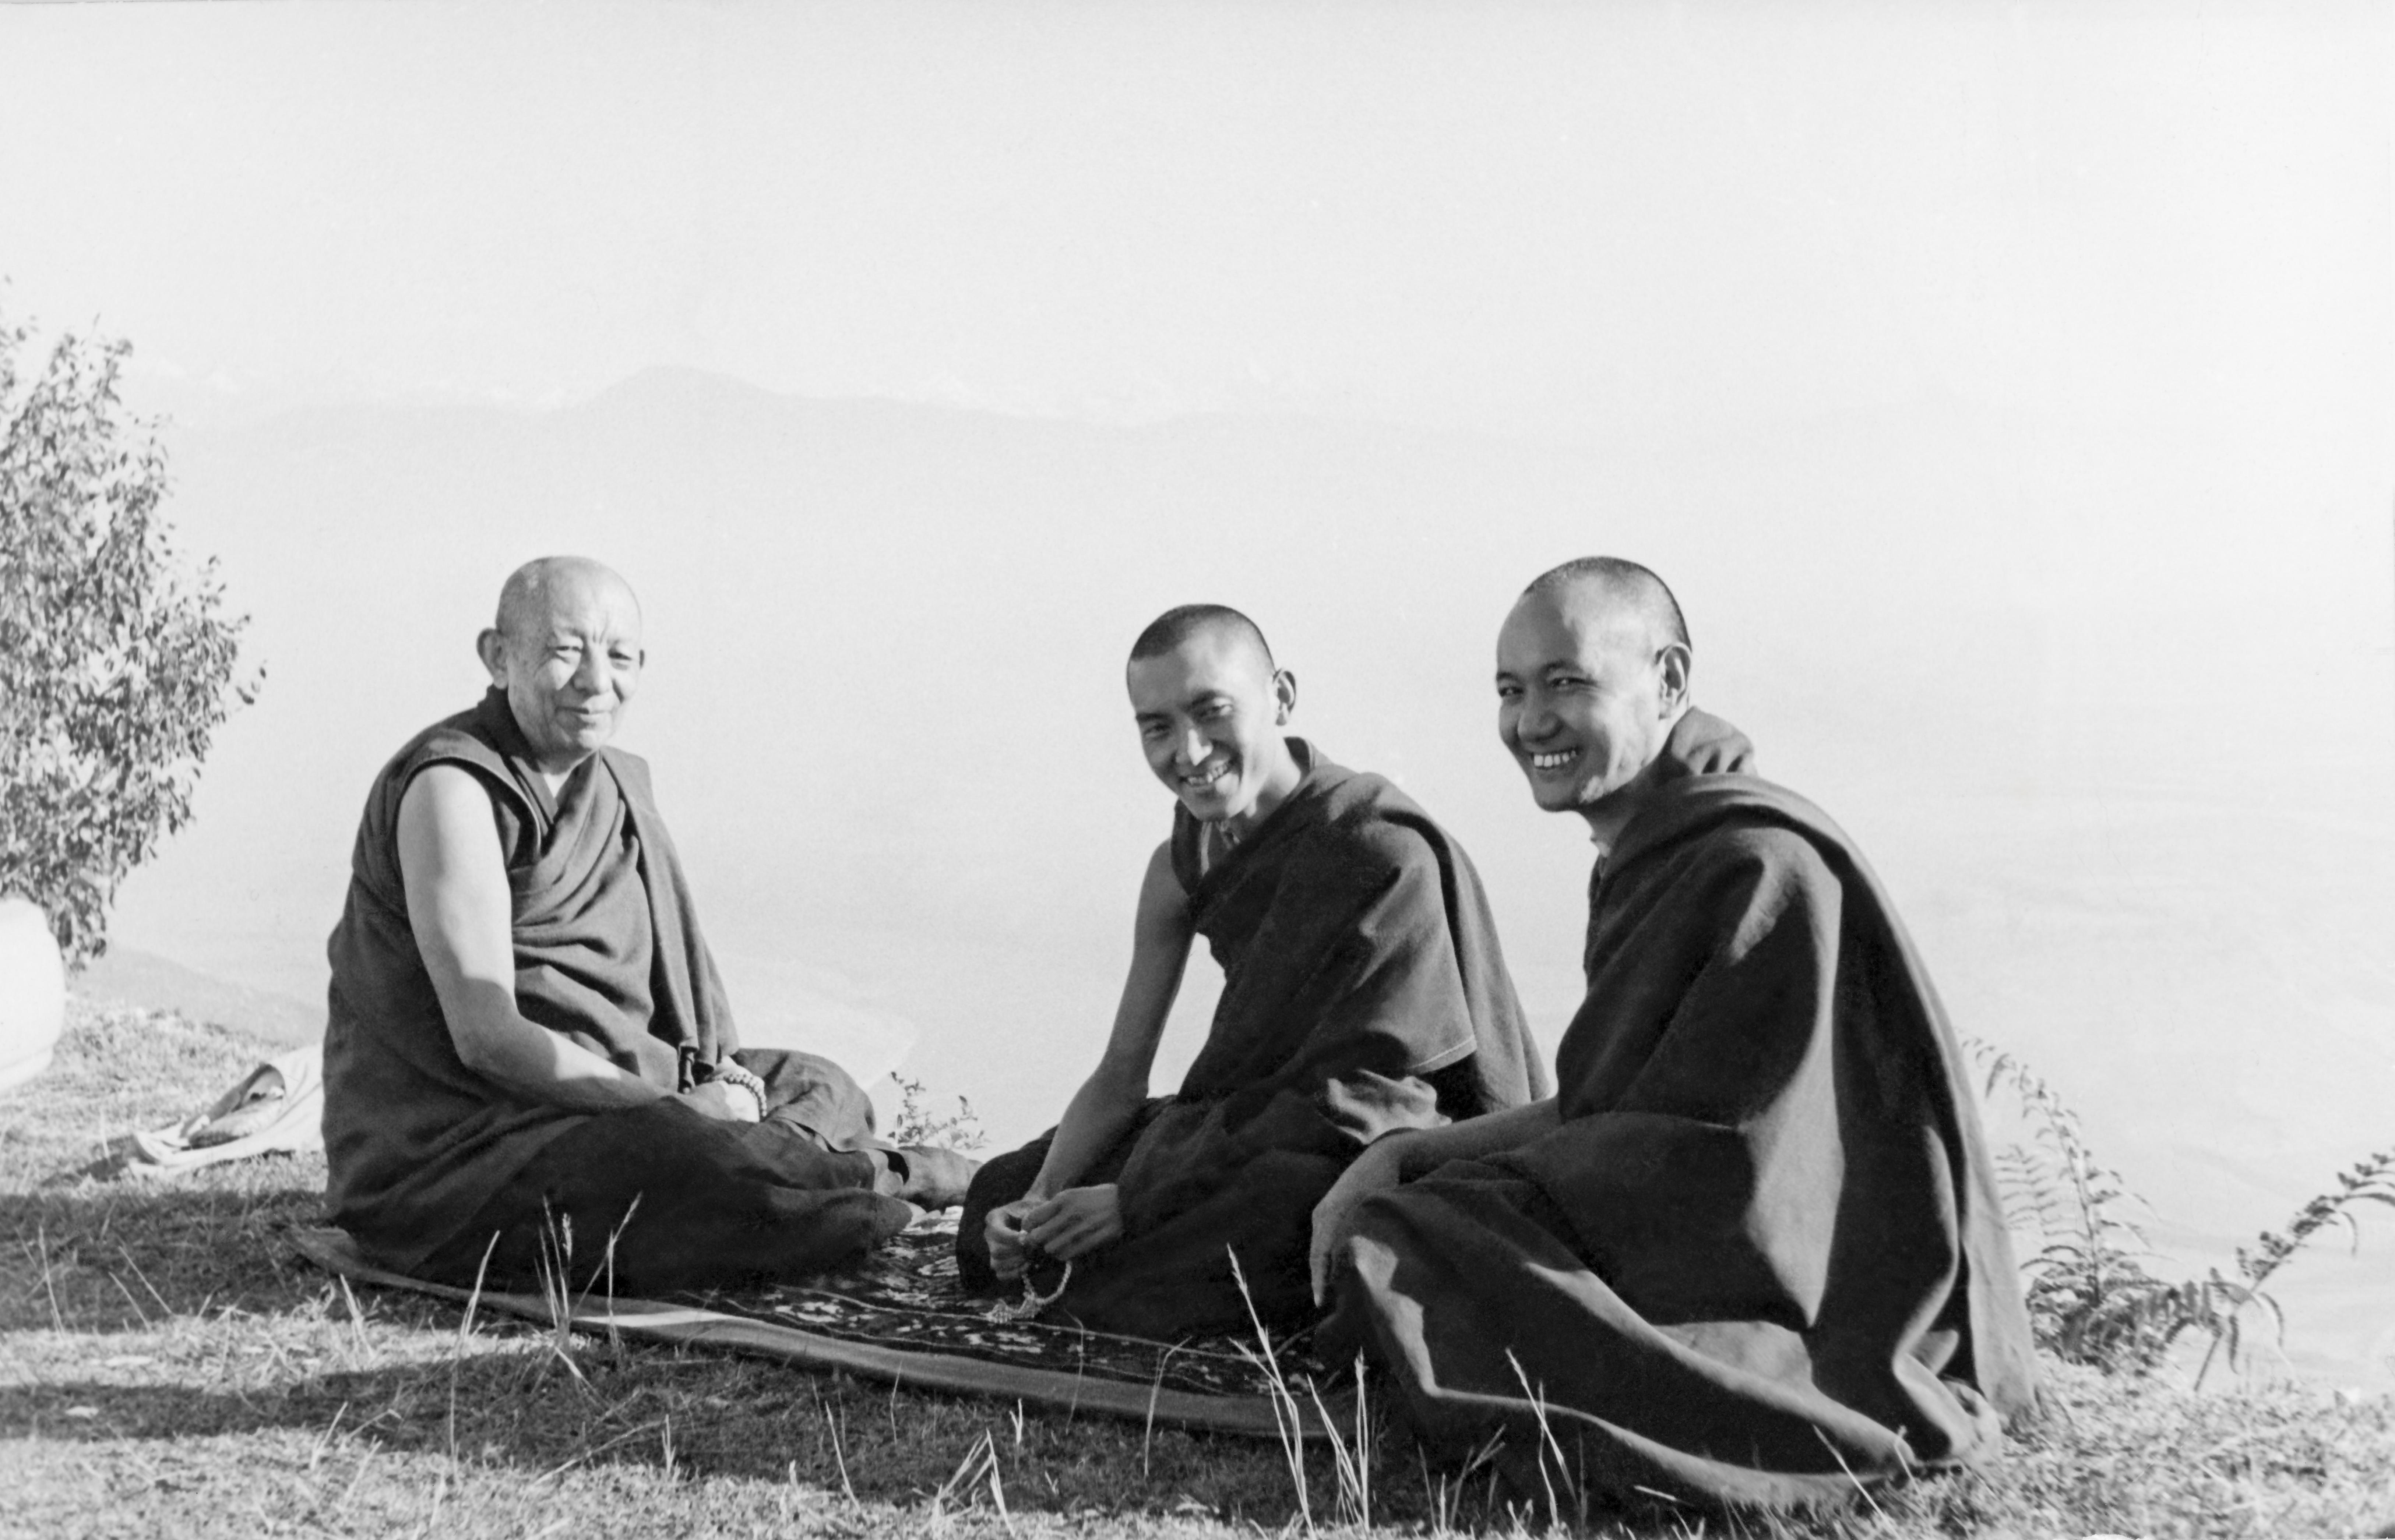 Kyabje Serkong Tsenshab Rinpoche (left) with Lama Zopa Rinpoche and Lama Yeshe at Kopan.Rinpoche received many teachings from Serkong Rinpoche includingtheJorchö practice.